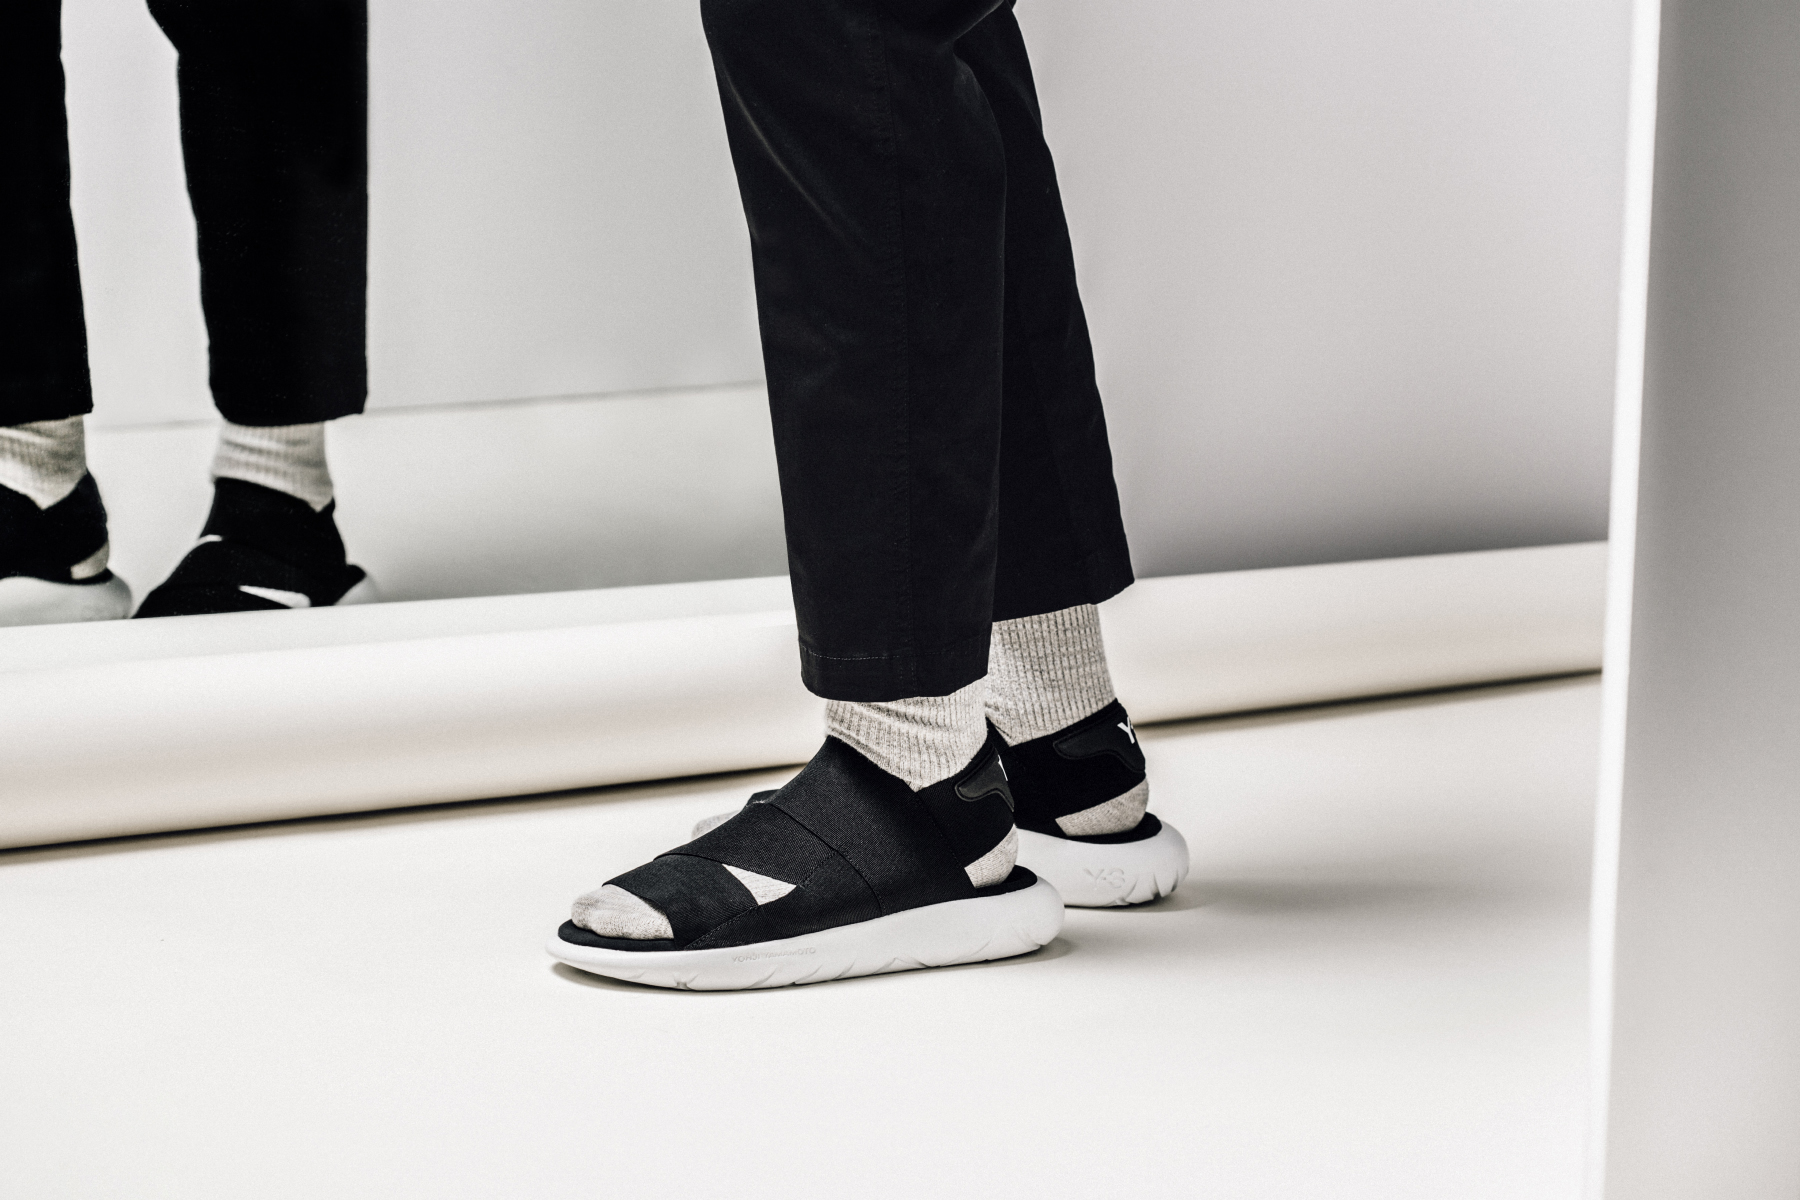 adidas Y-3 Qasa Sandal // Available Now